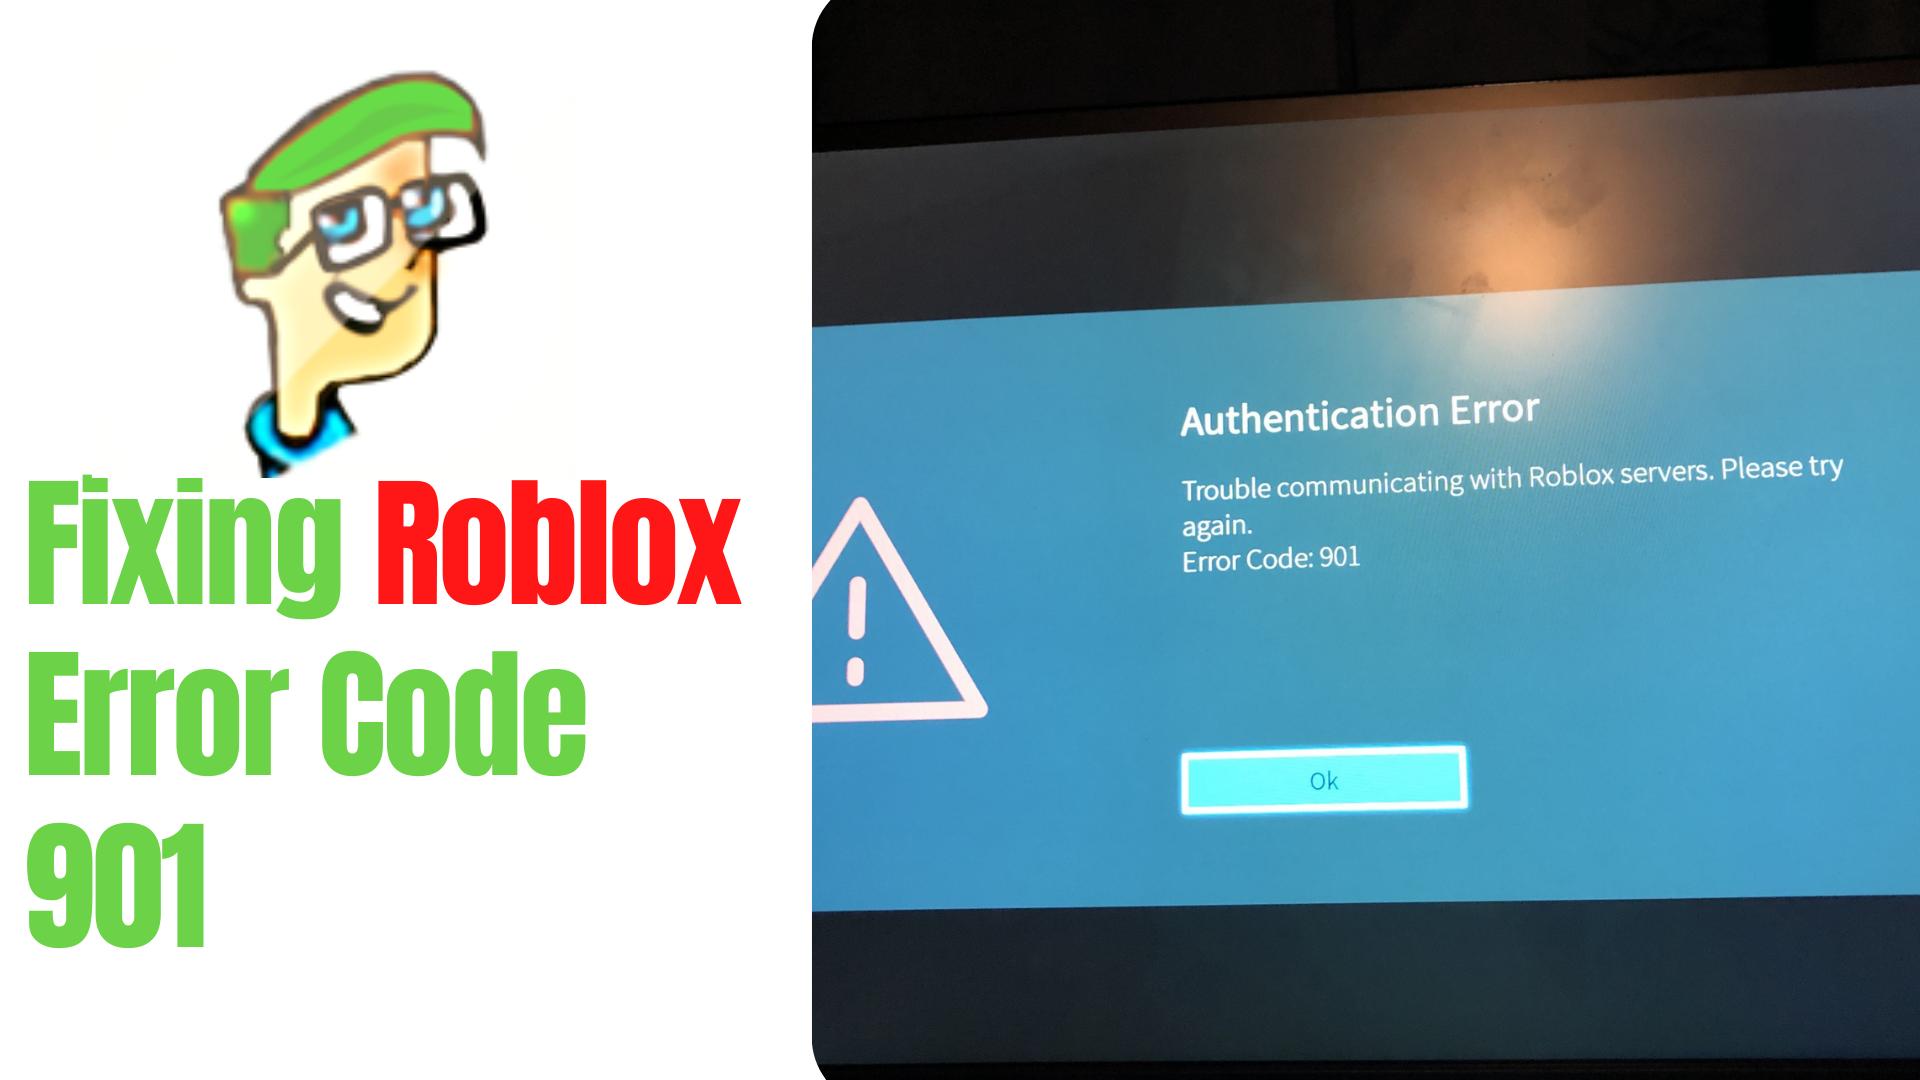 Roblox Error Code 901